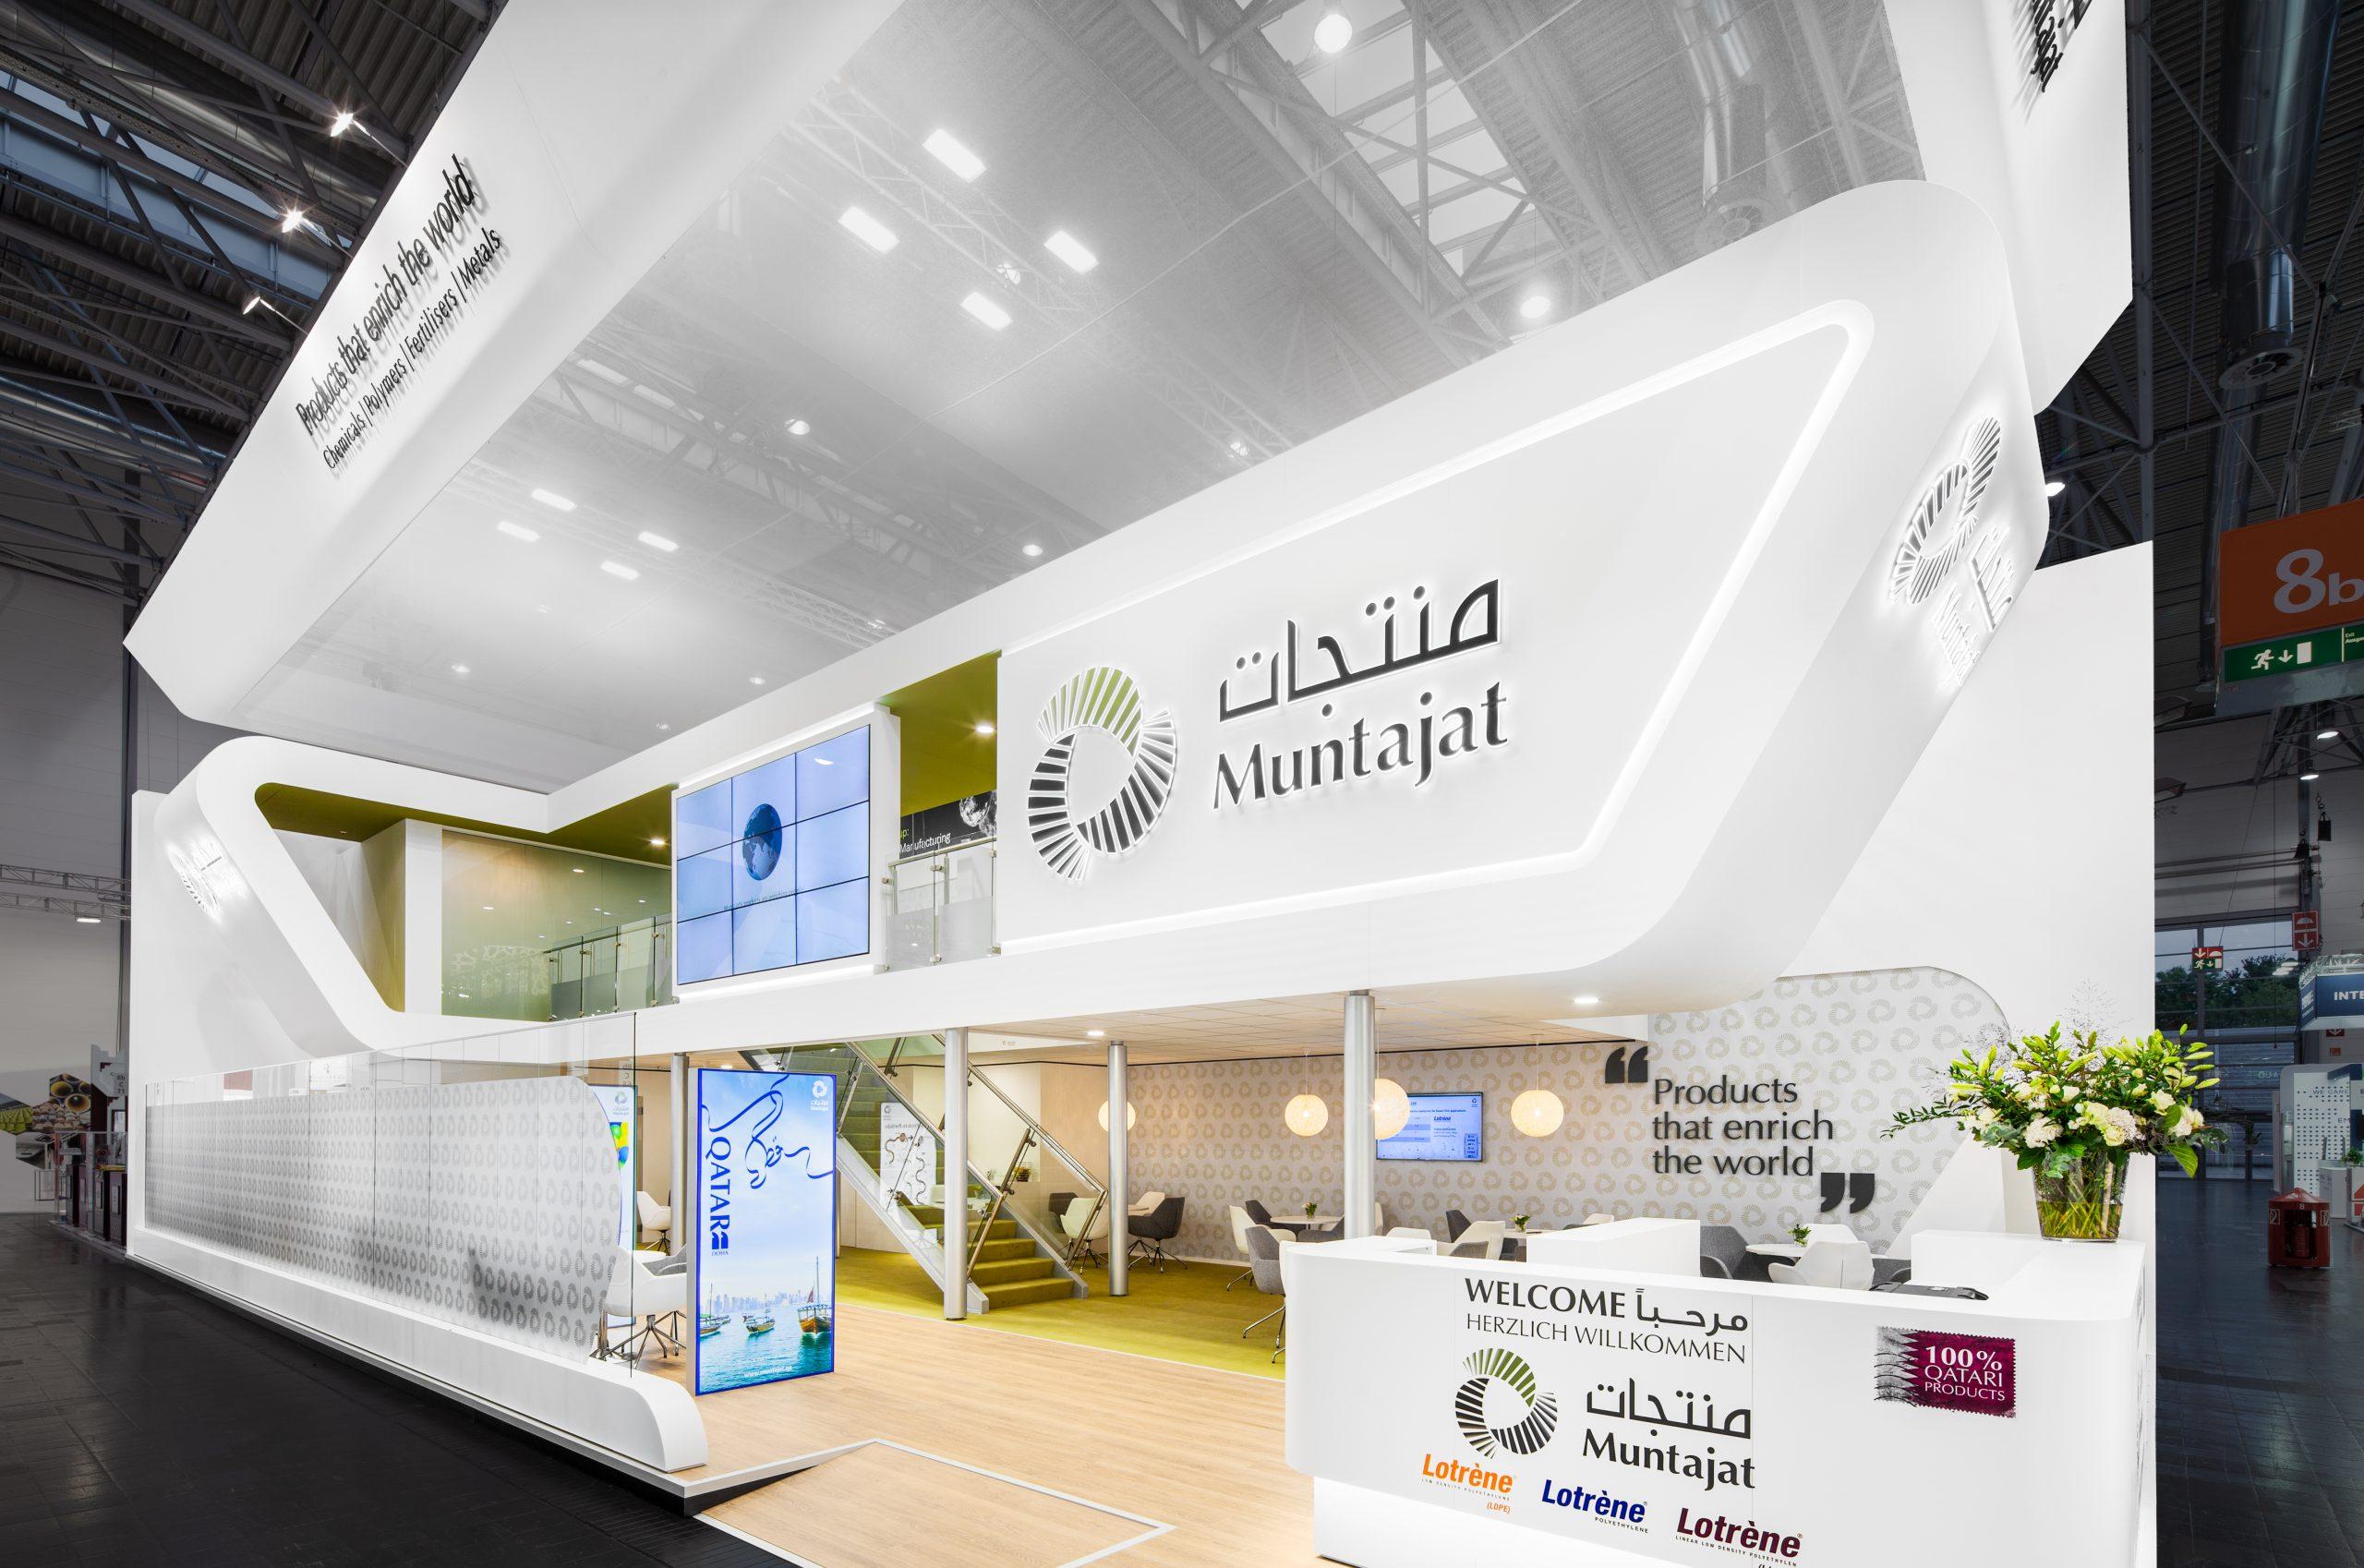 CAS Exhibition Partners - Muntajat - K 2019 - Düsseldorf - Standbouwfotografie #9445